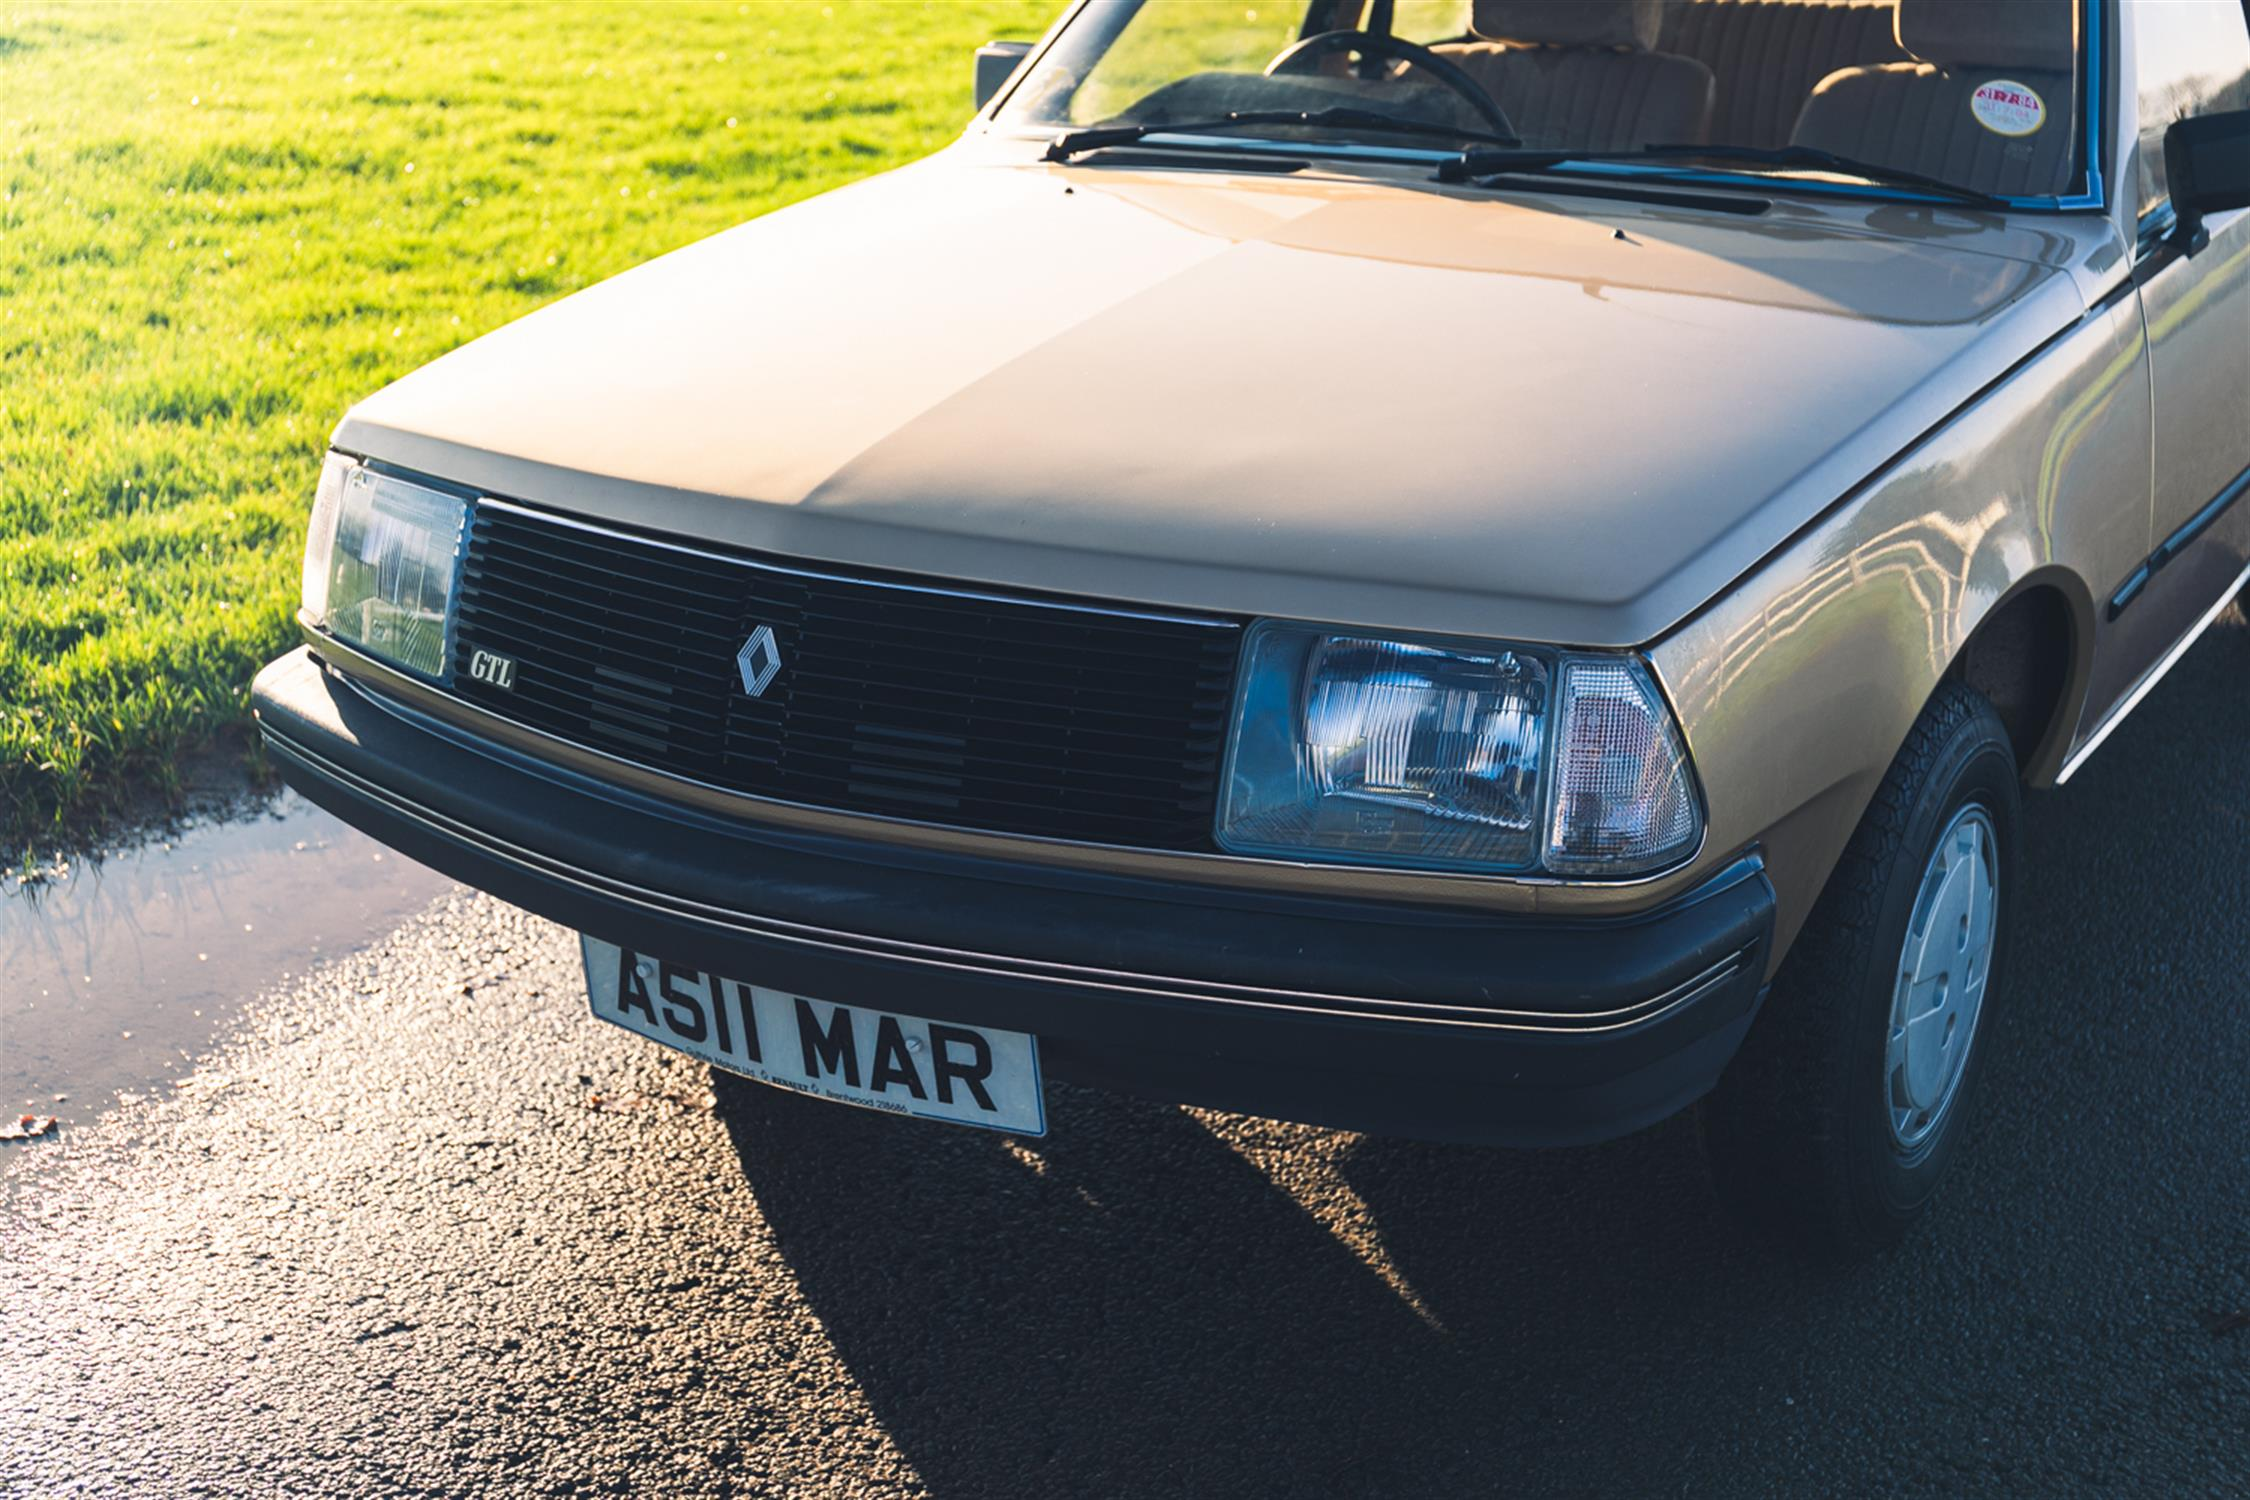 1983 Renault 18 GTL Estate - Image 24 of 32